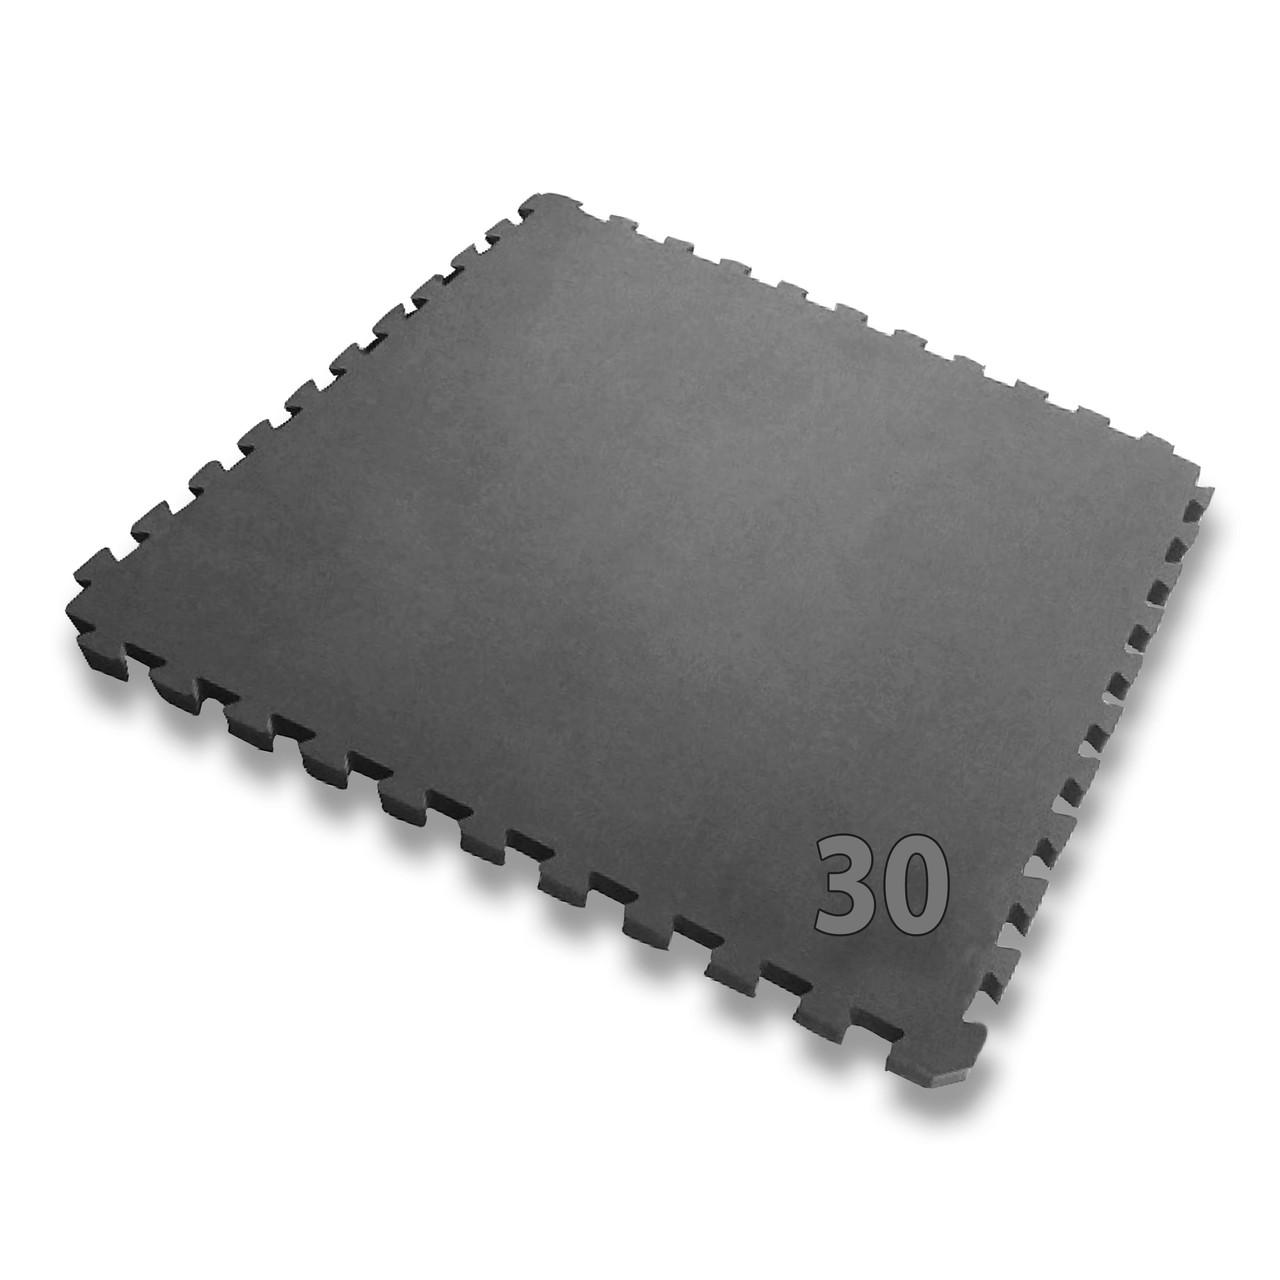 Лист 30 мм ППЭ НХ (Украина), серый